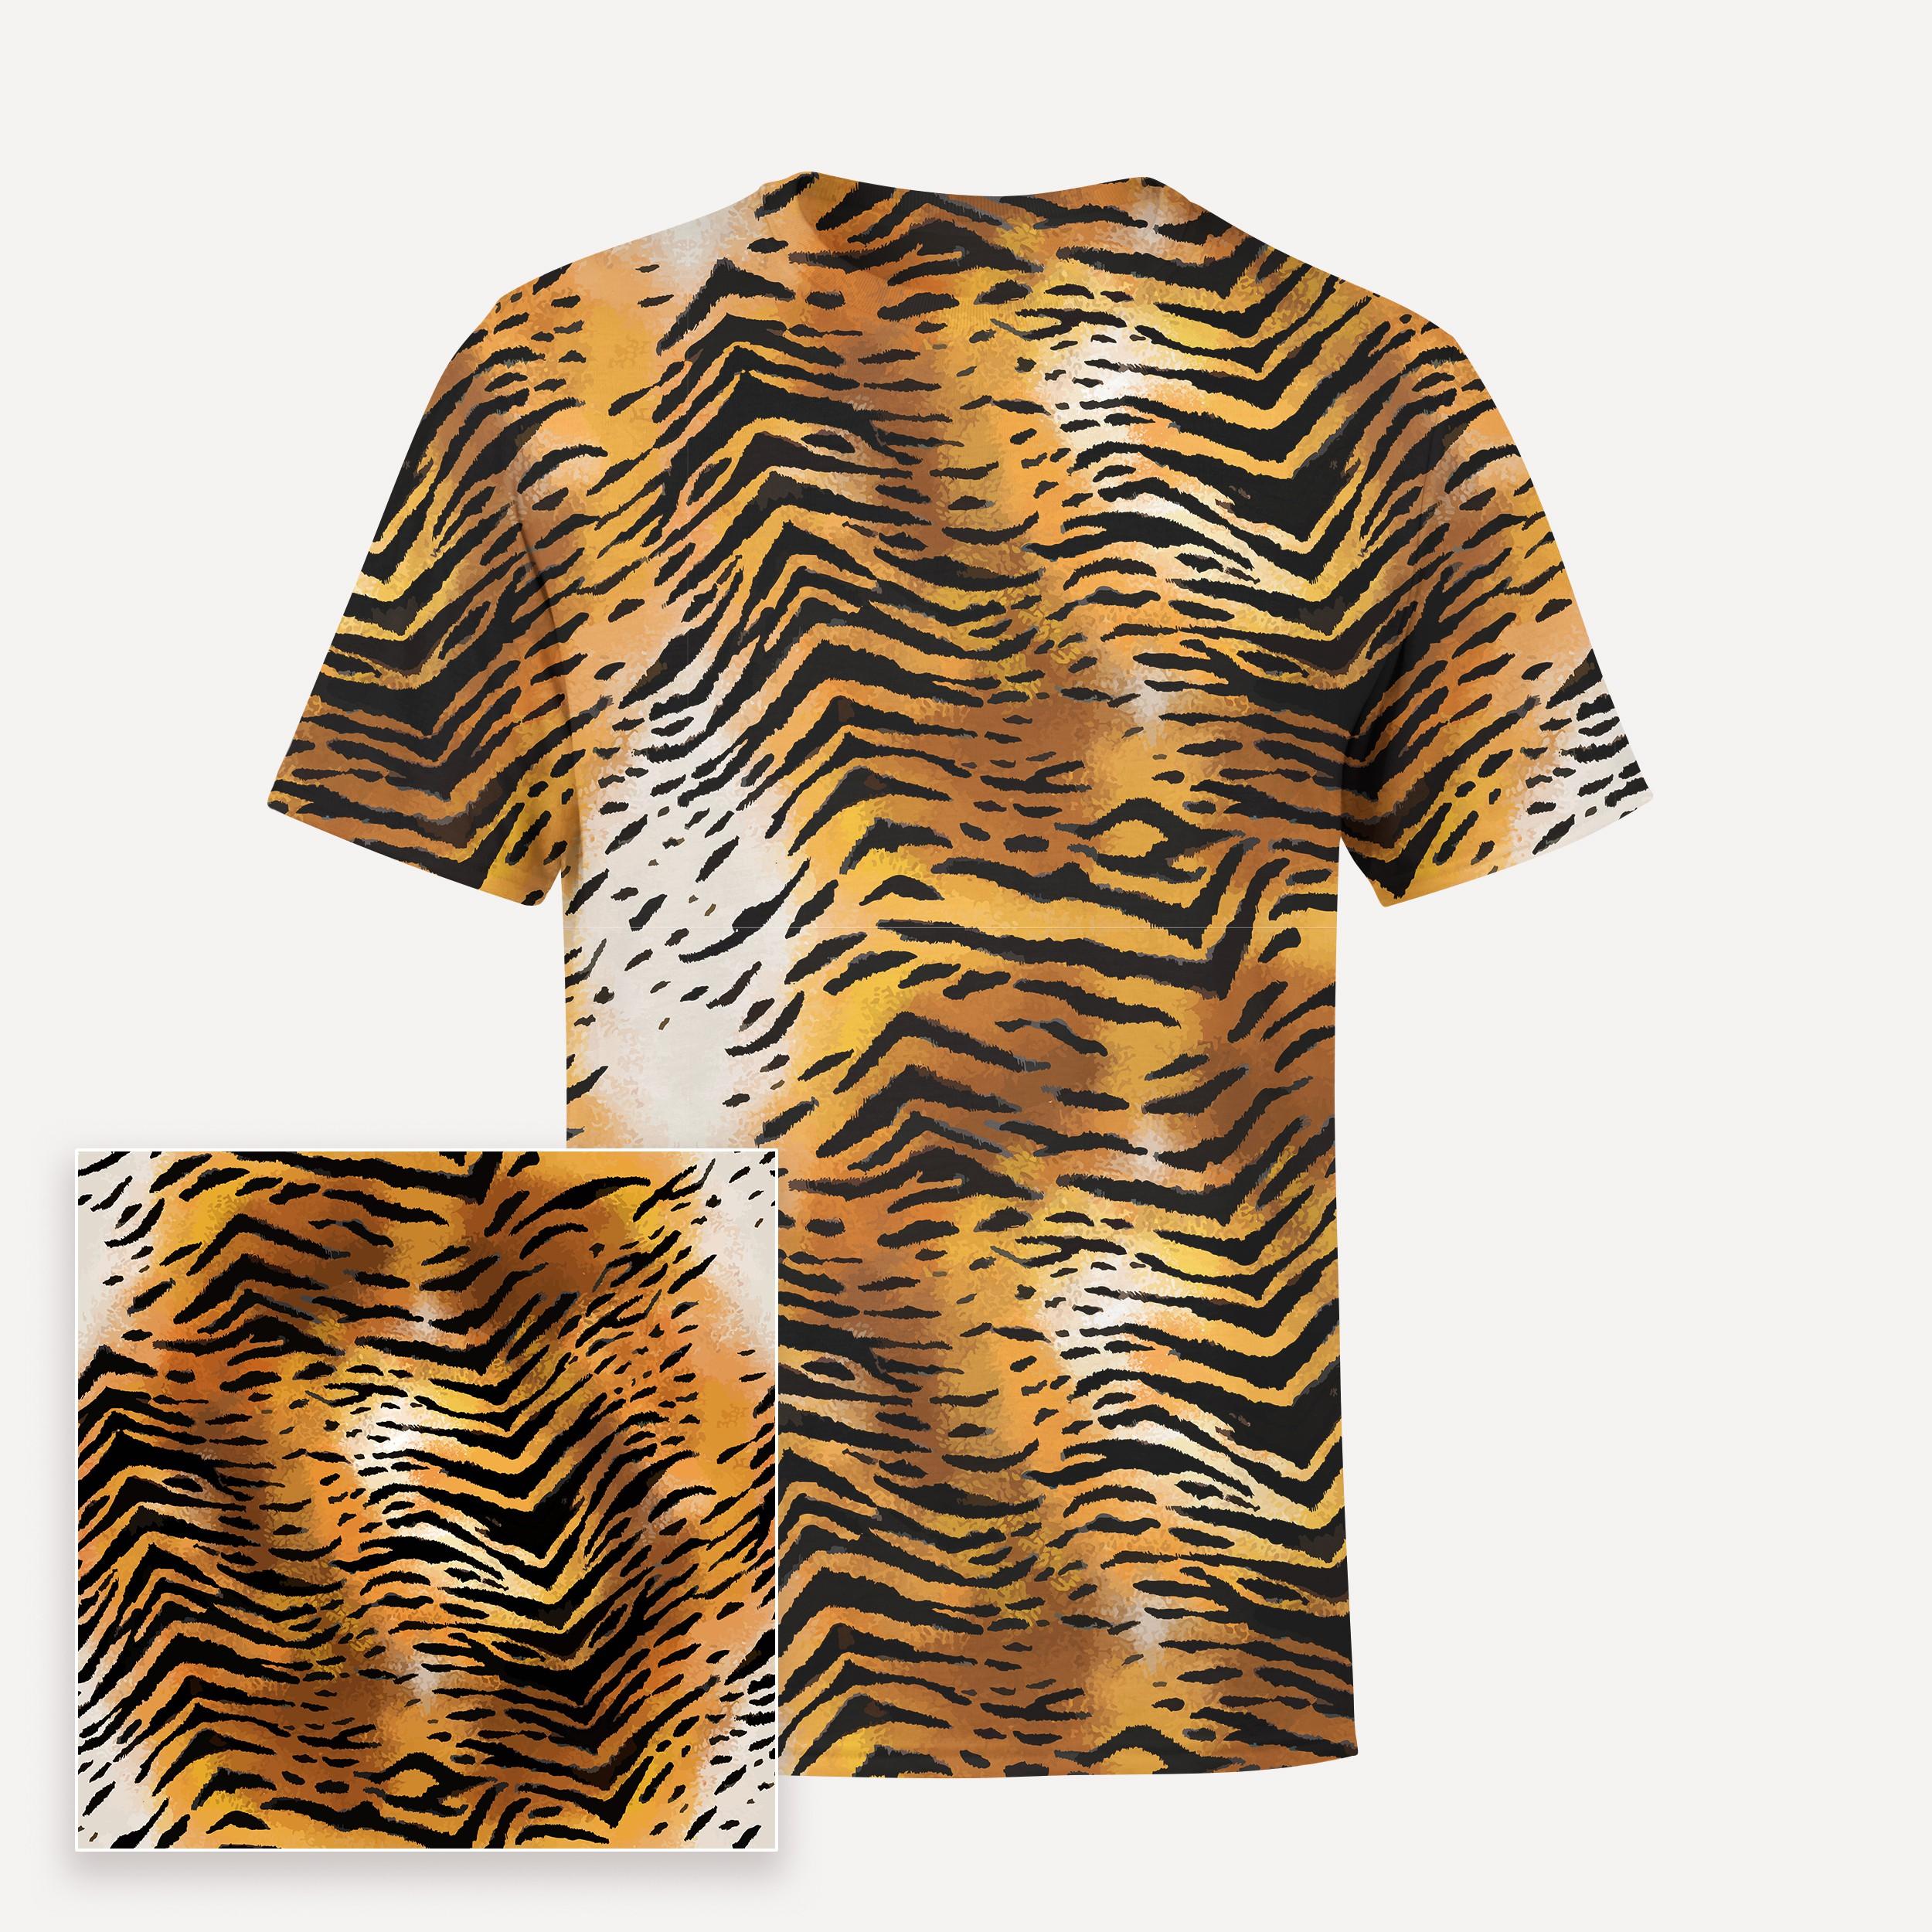 Tiger stripes print for textile